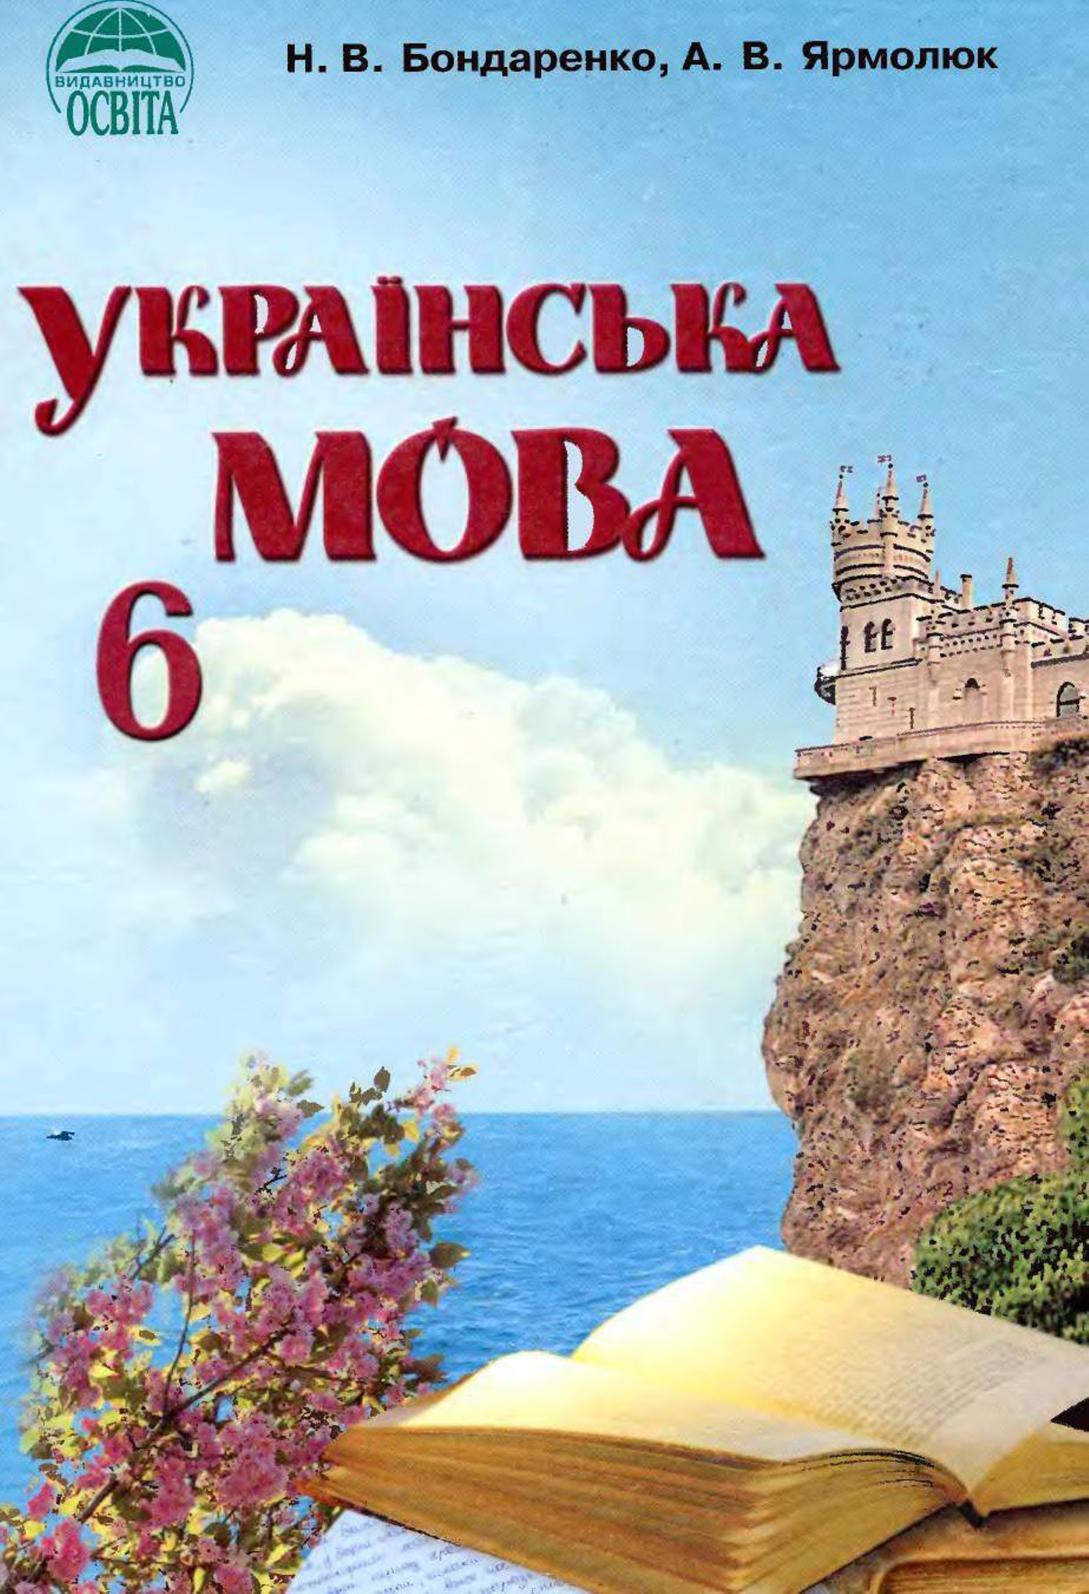 Calaméo - 6 клас. Українська мова (Бондаренко 29435dac88a53